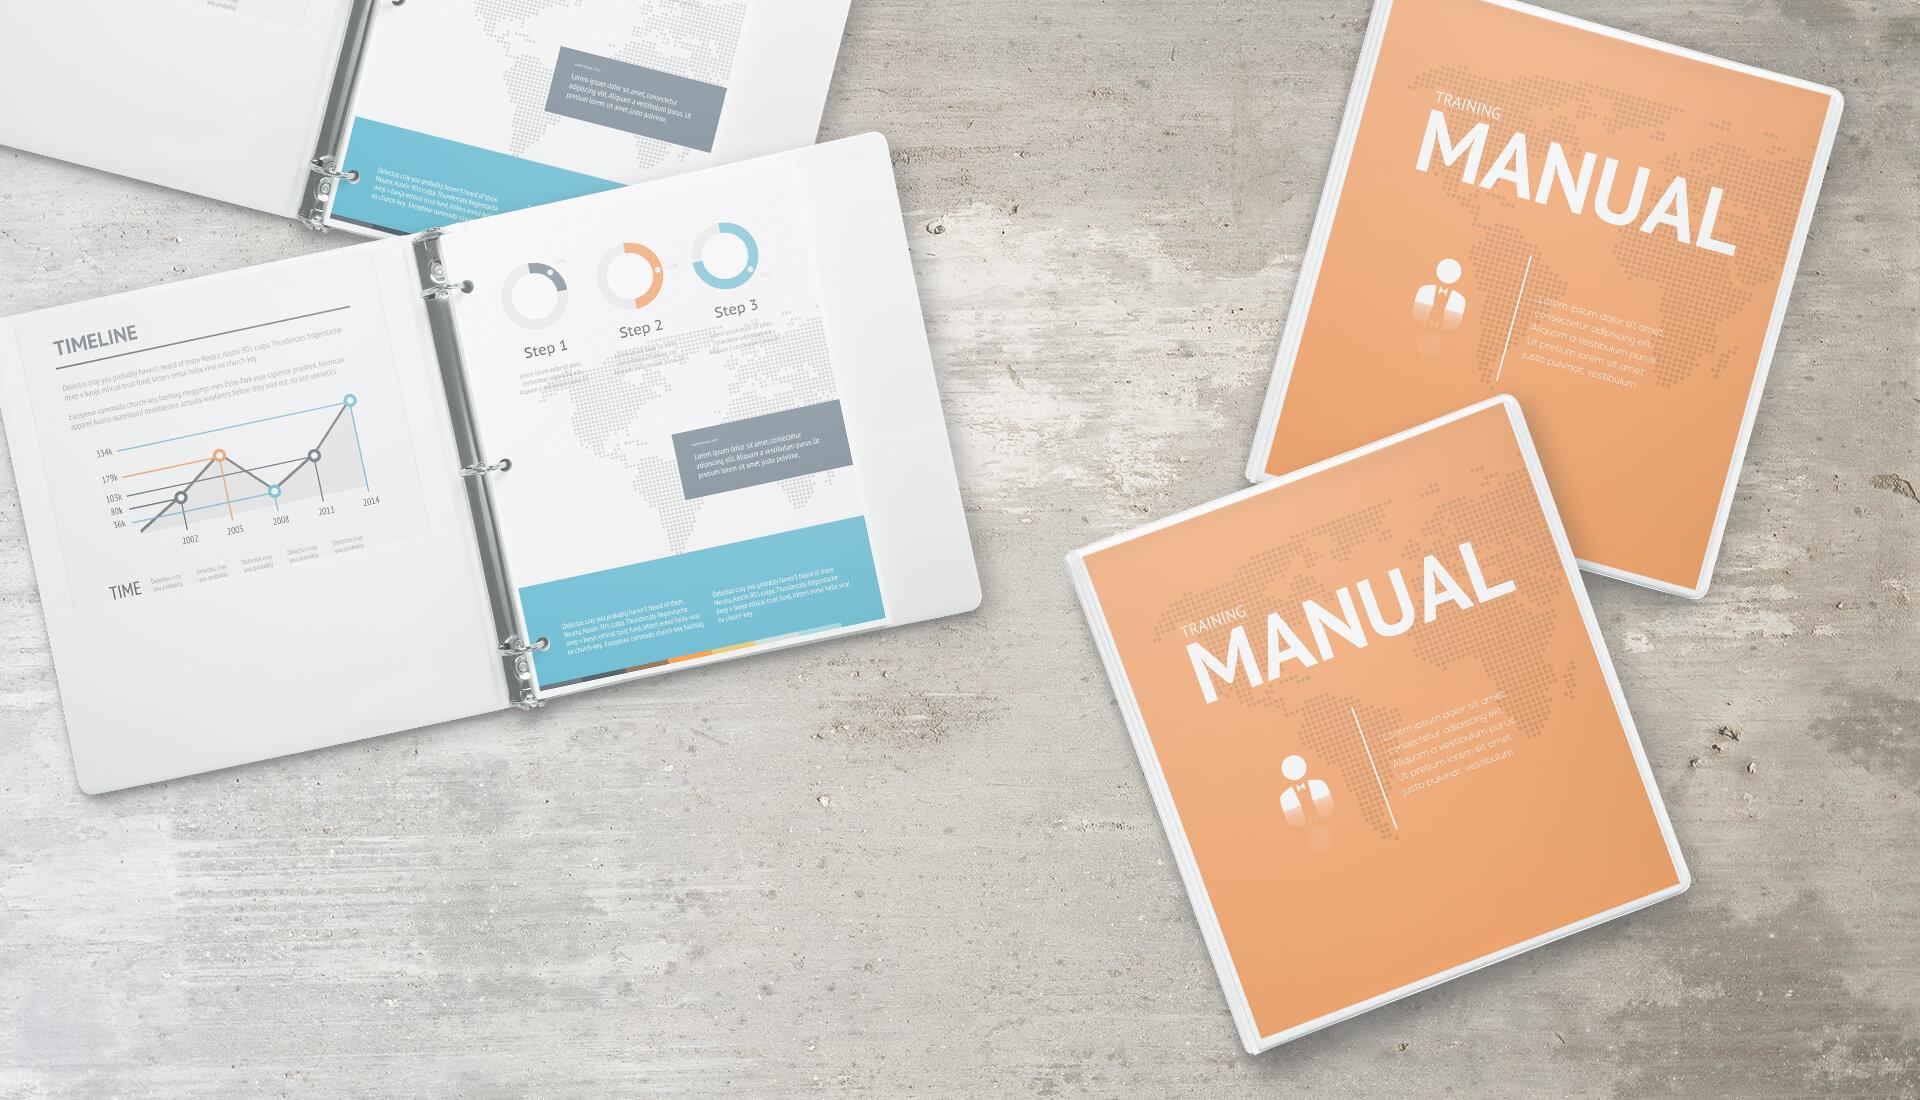 write-manuals